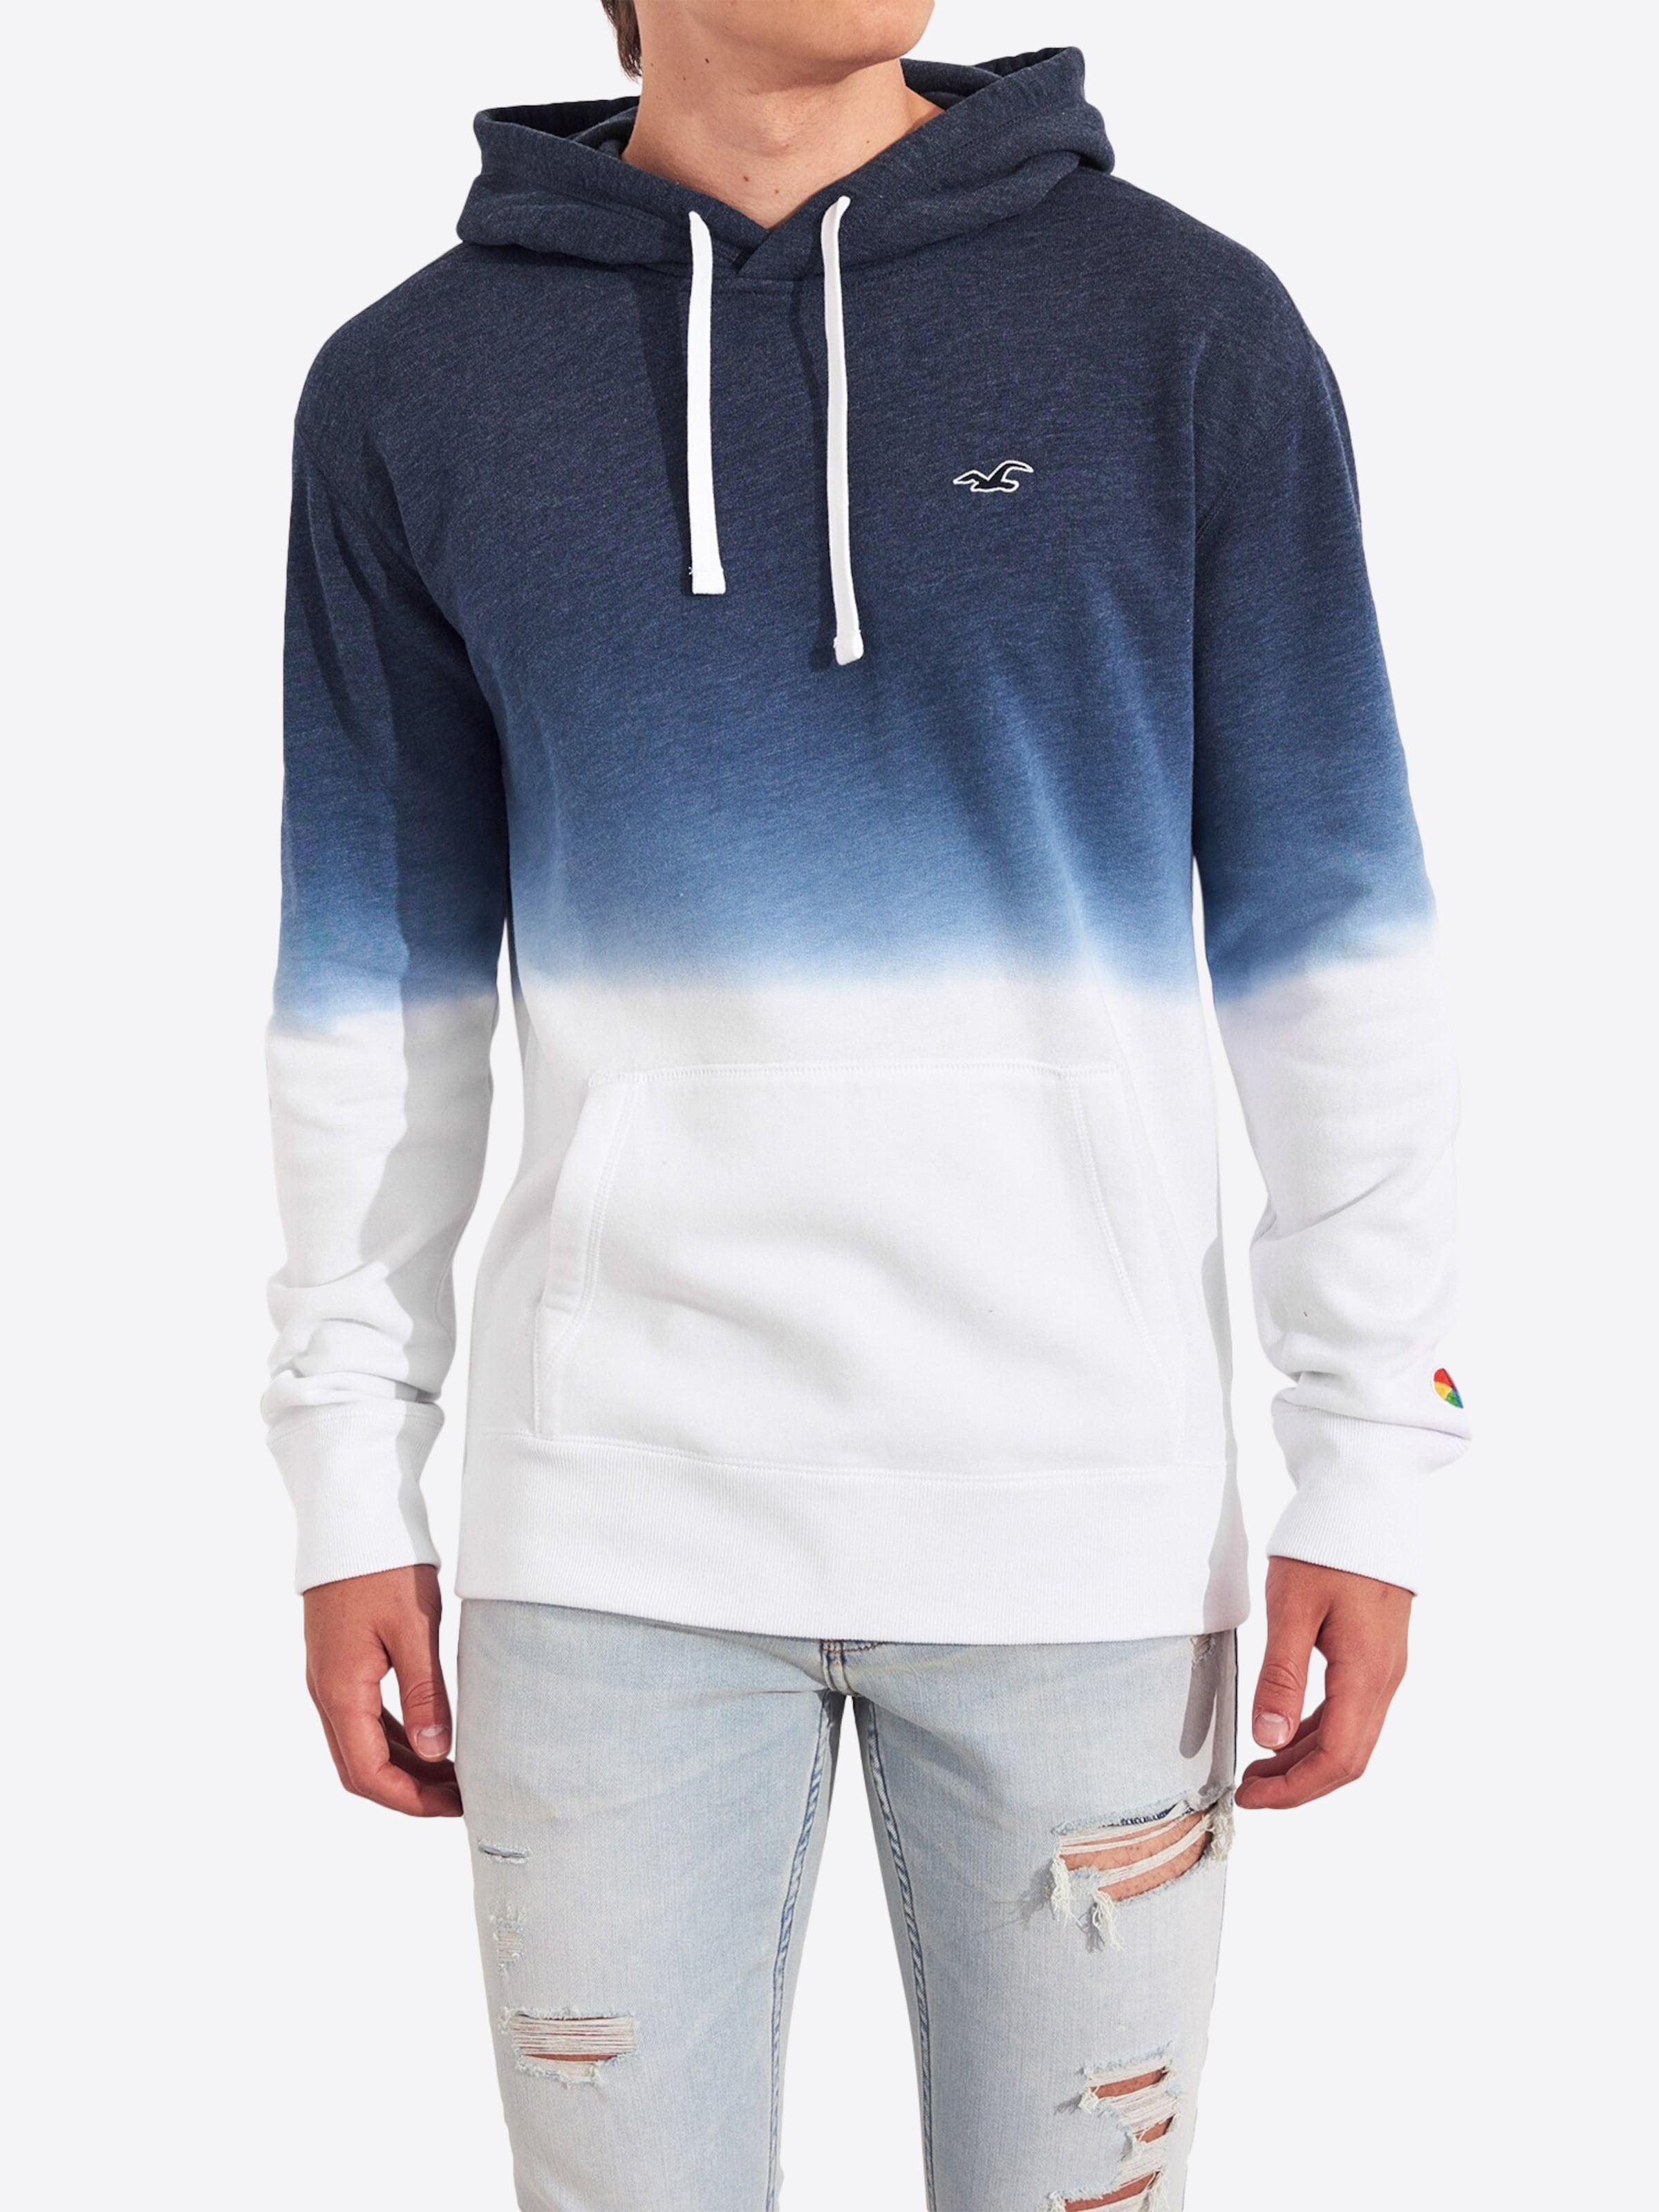 shirt Bleu En Sweat Marine Hollister PZOXuTki